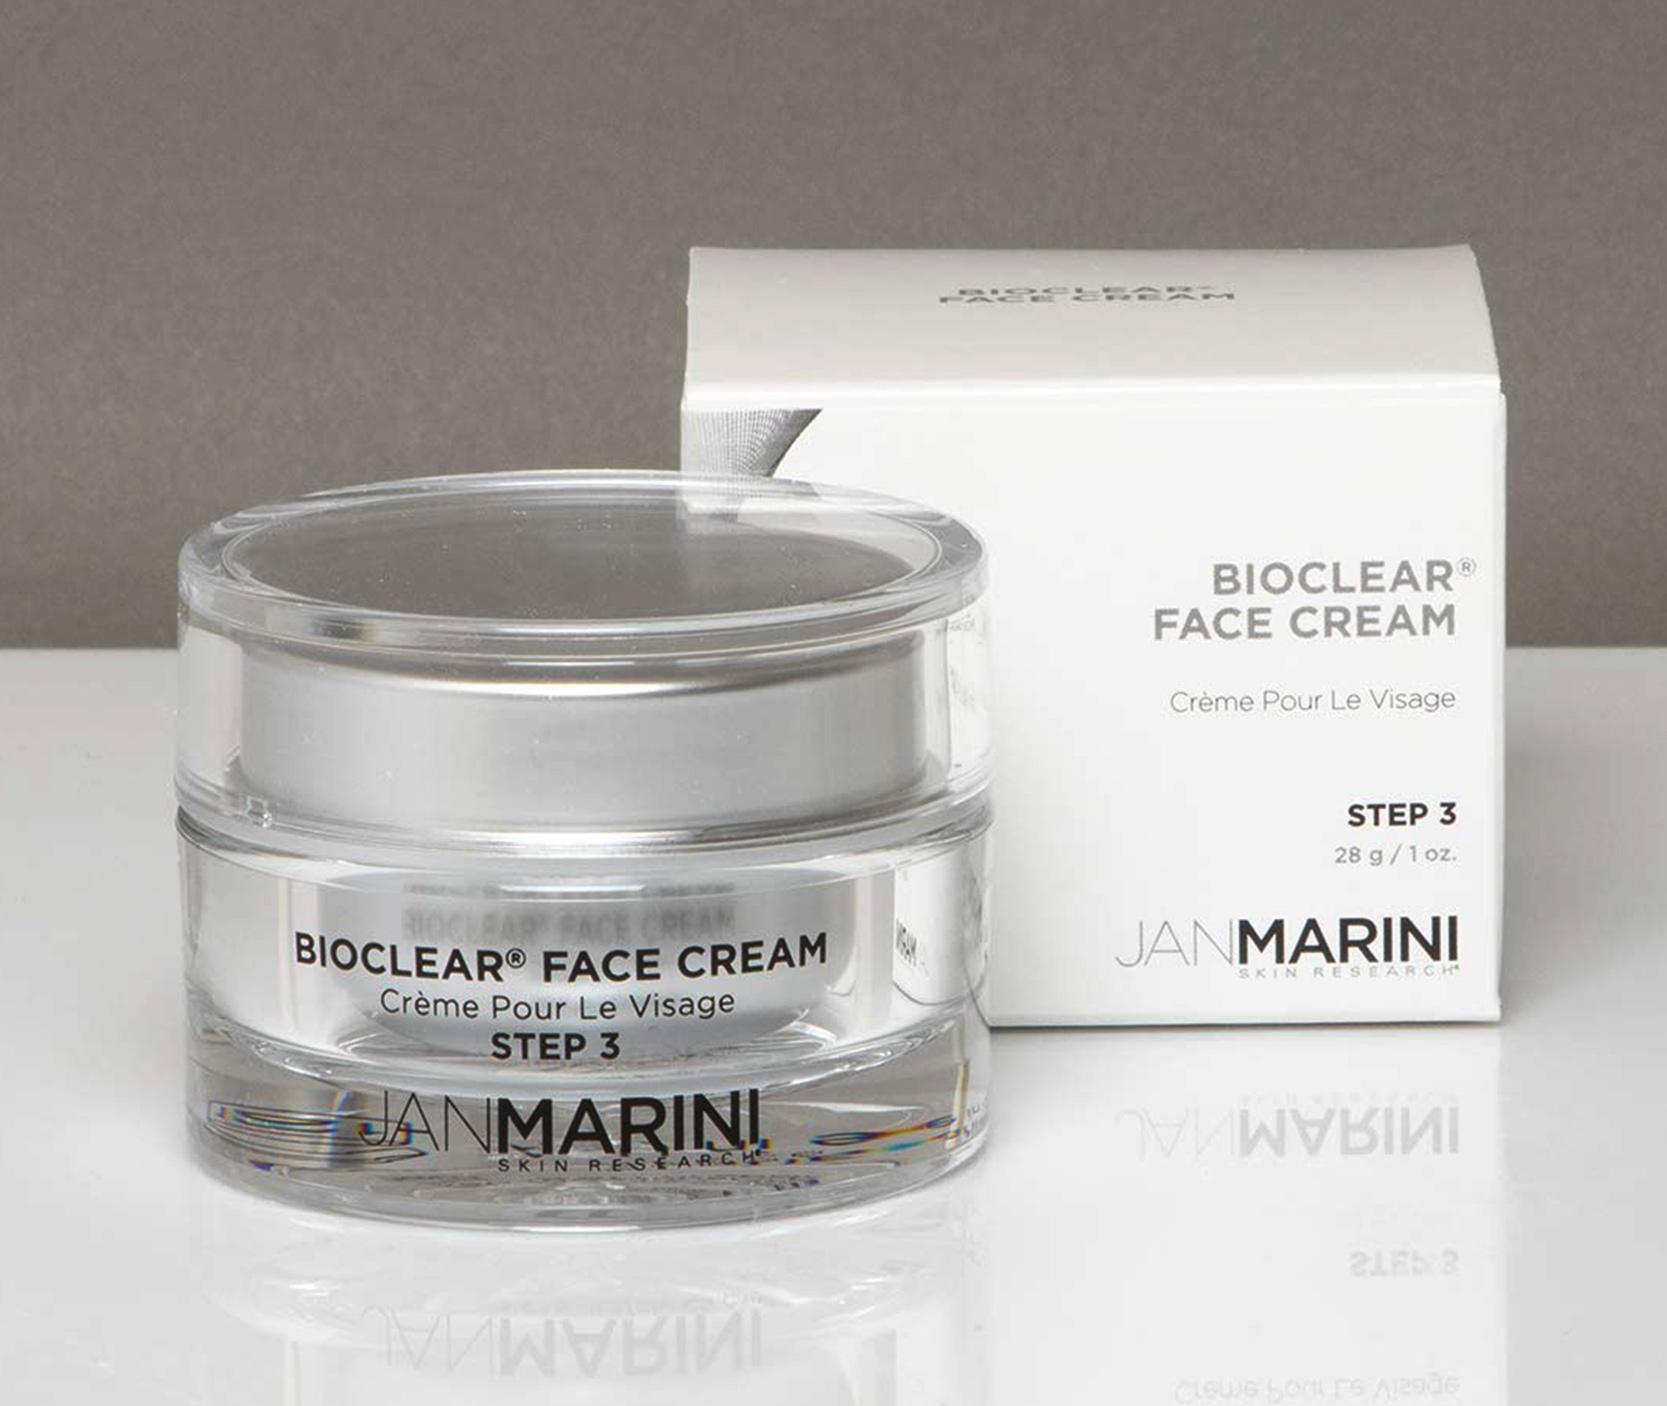 Jan Marini: Bioclear Face Cream